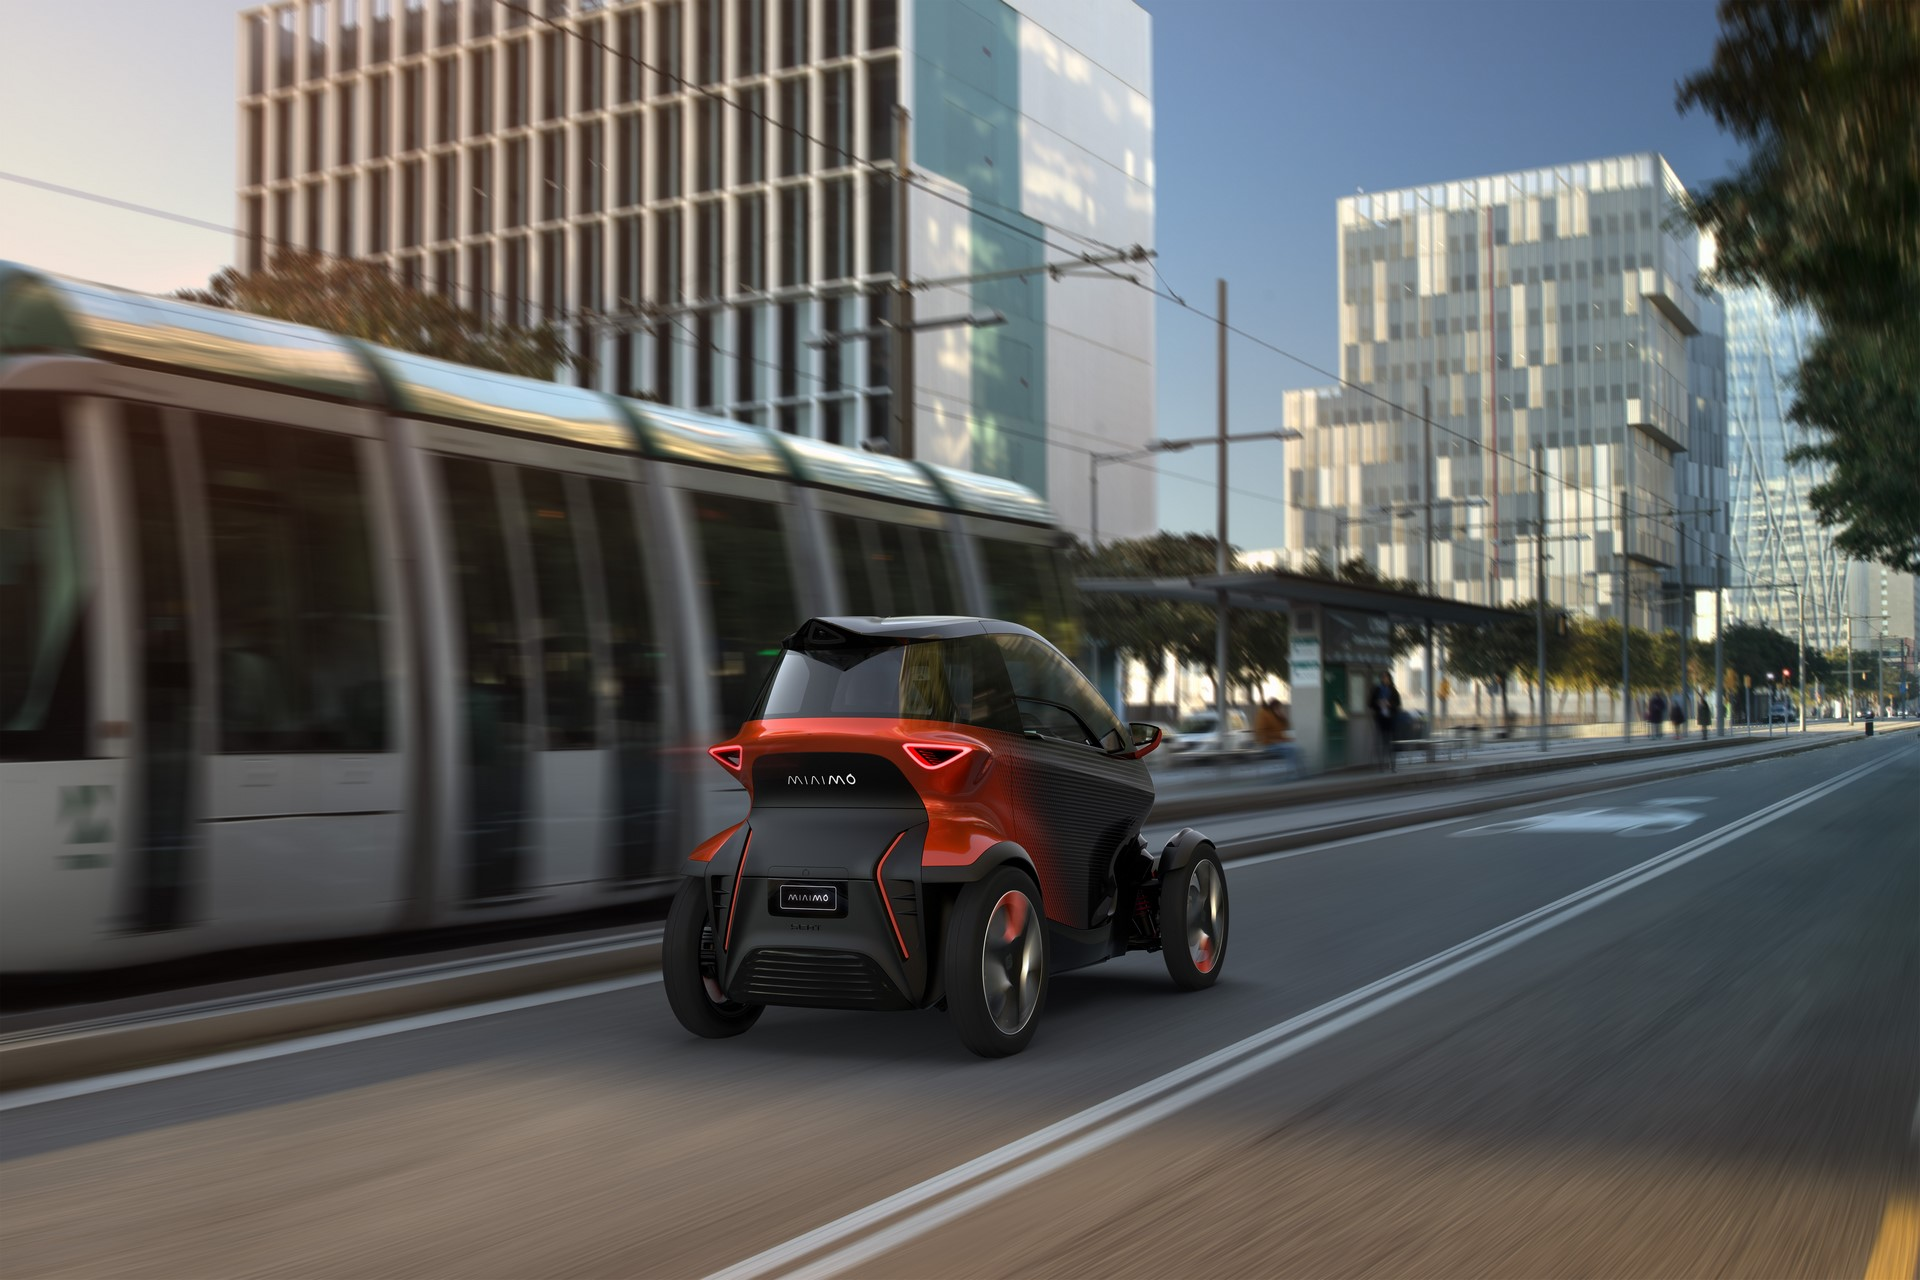 Seat Minimo concept (7)